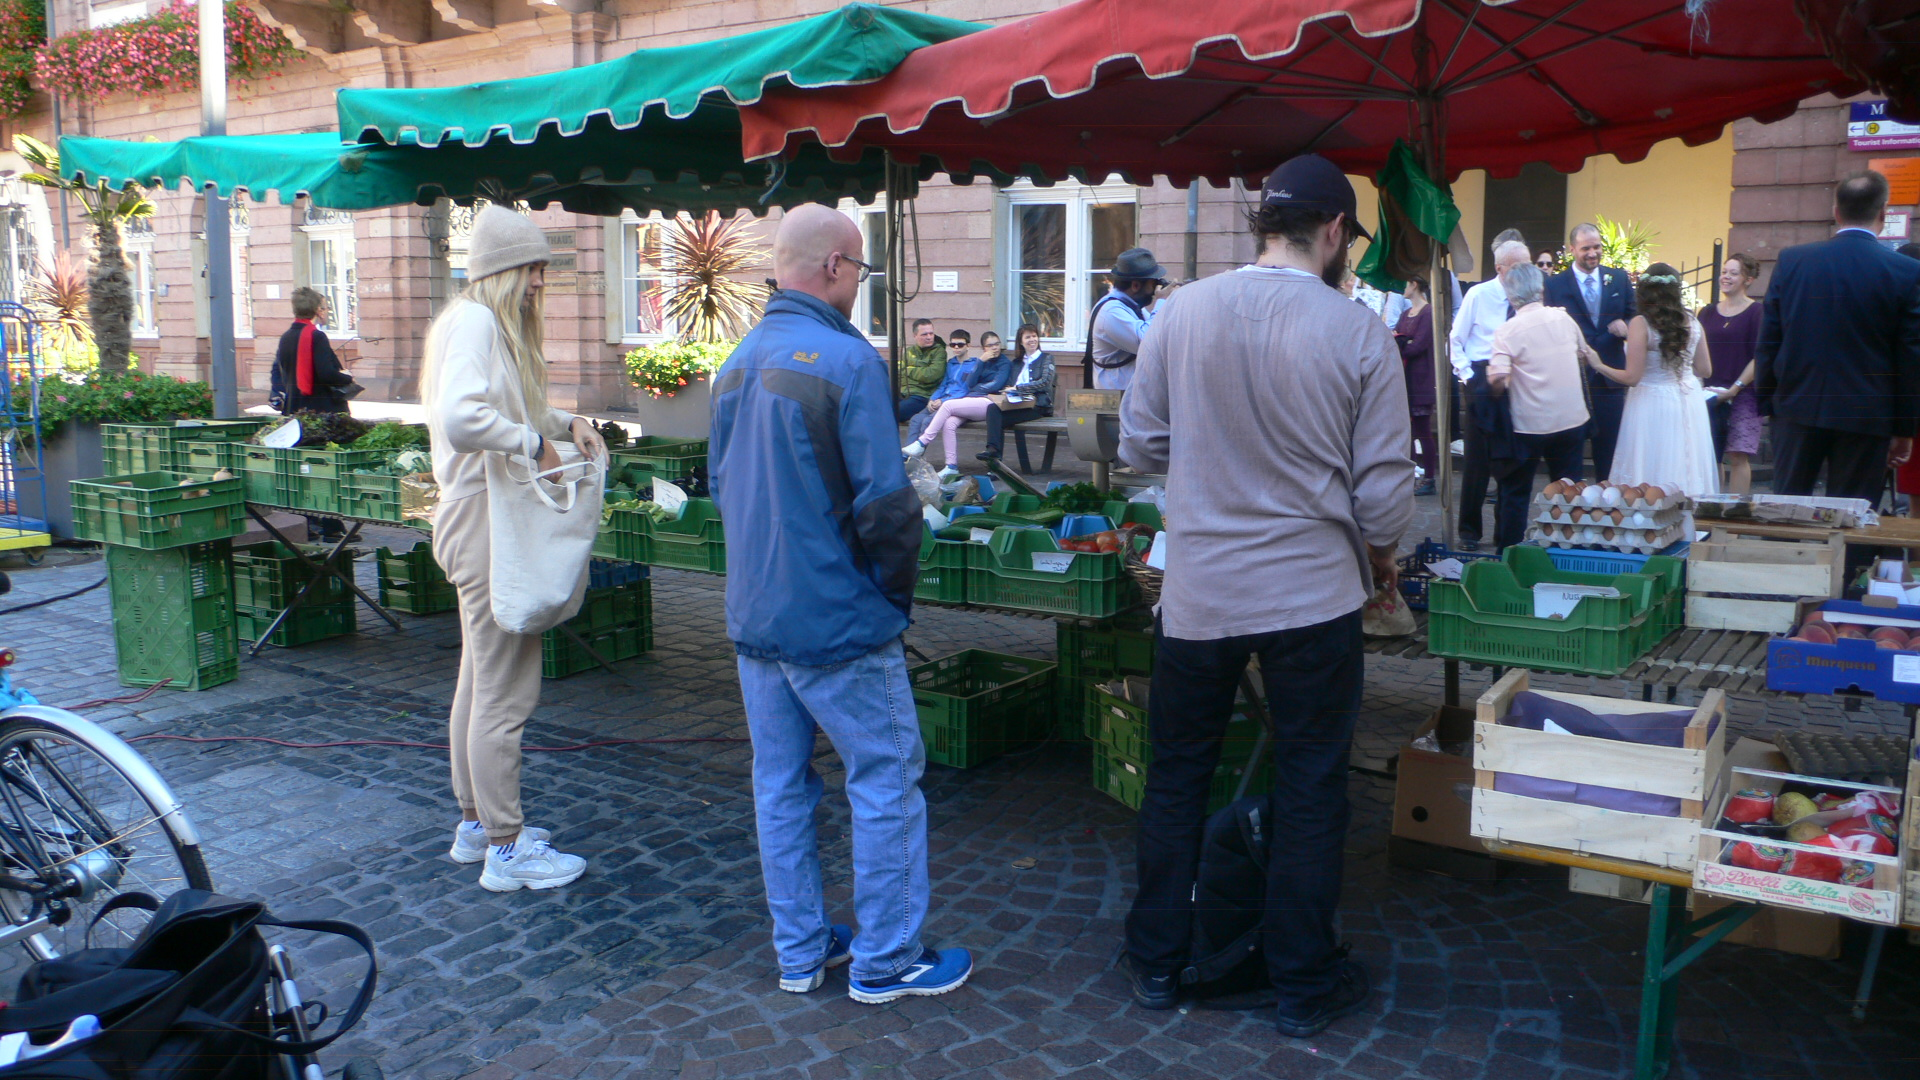 Bauernhof Meng auf dem Markt Heidelberg Altstadt